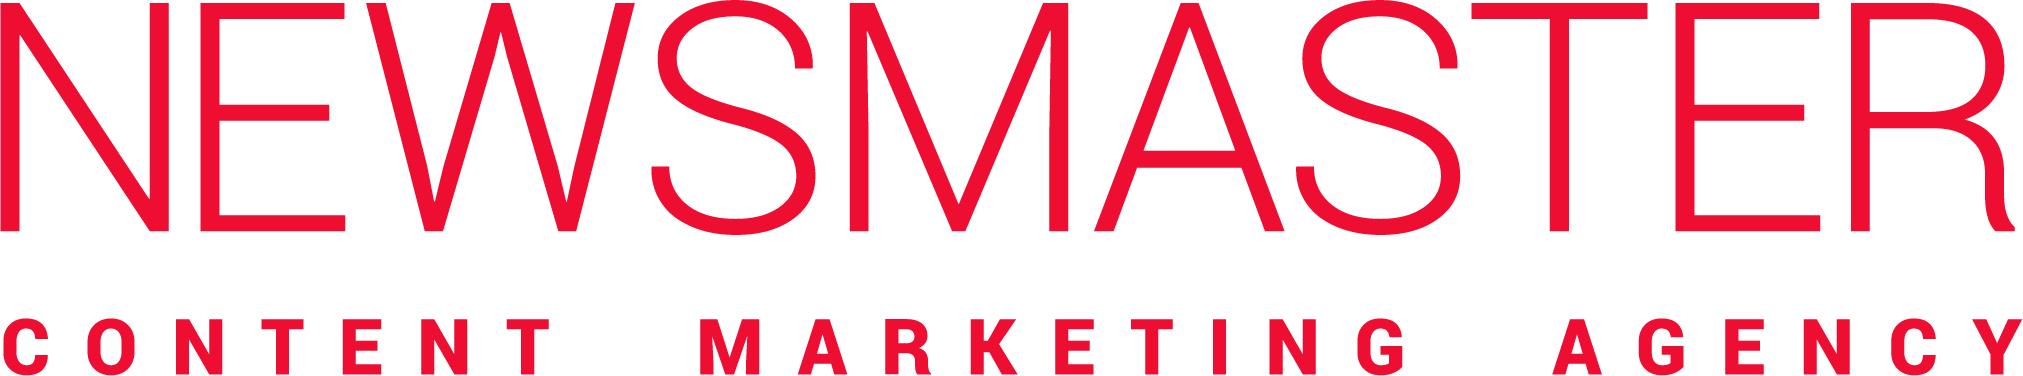 logo-newsmaster